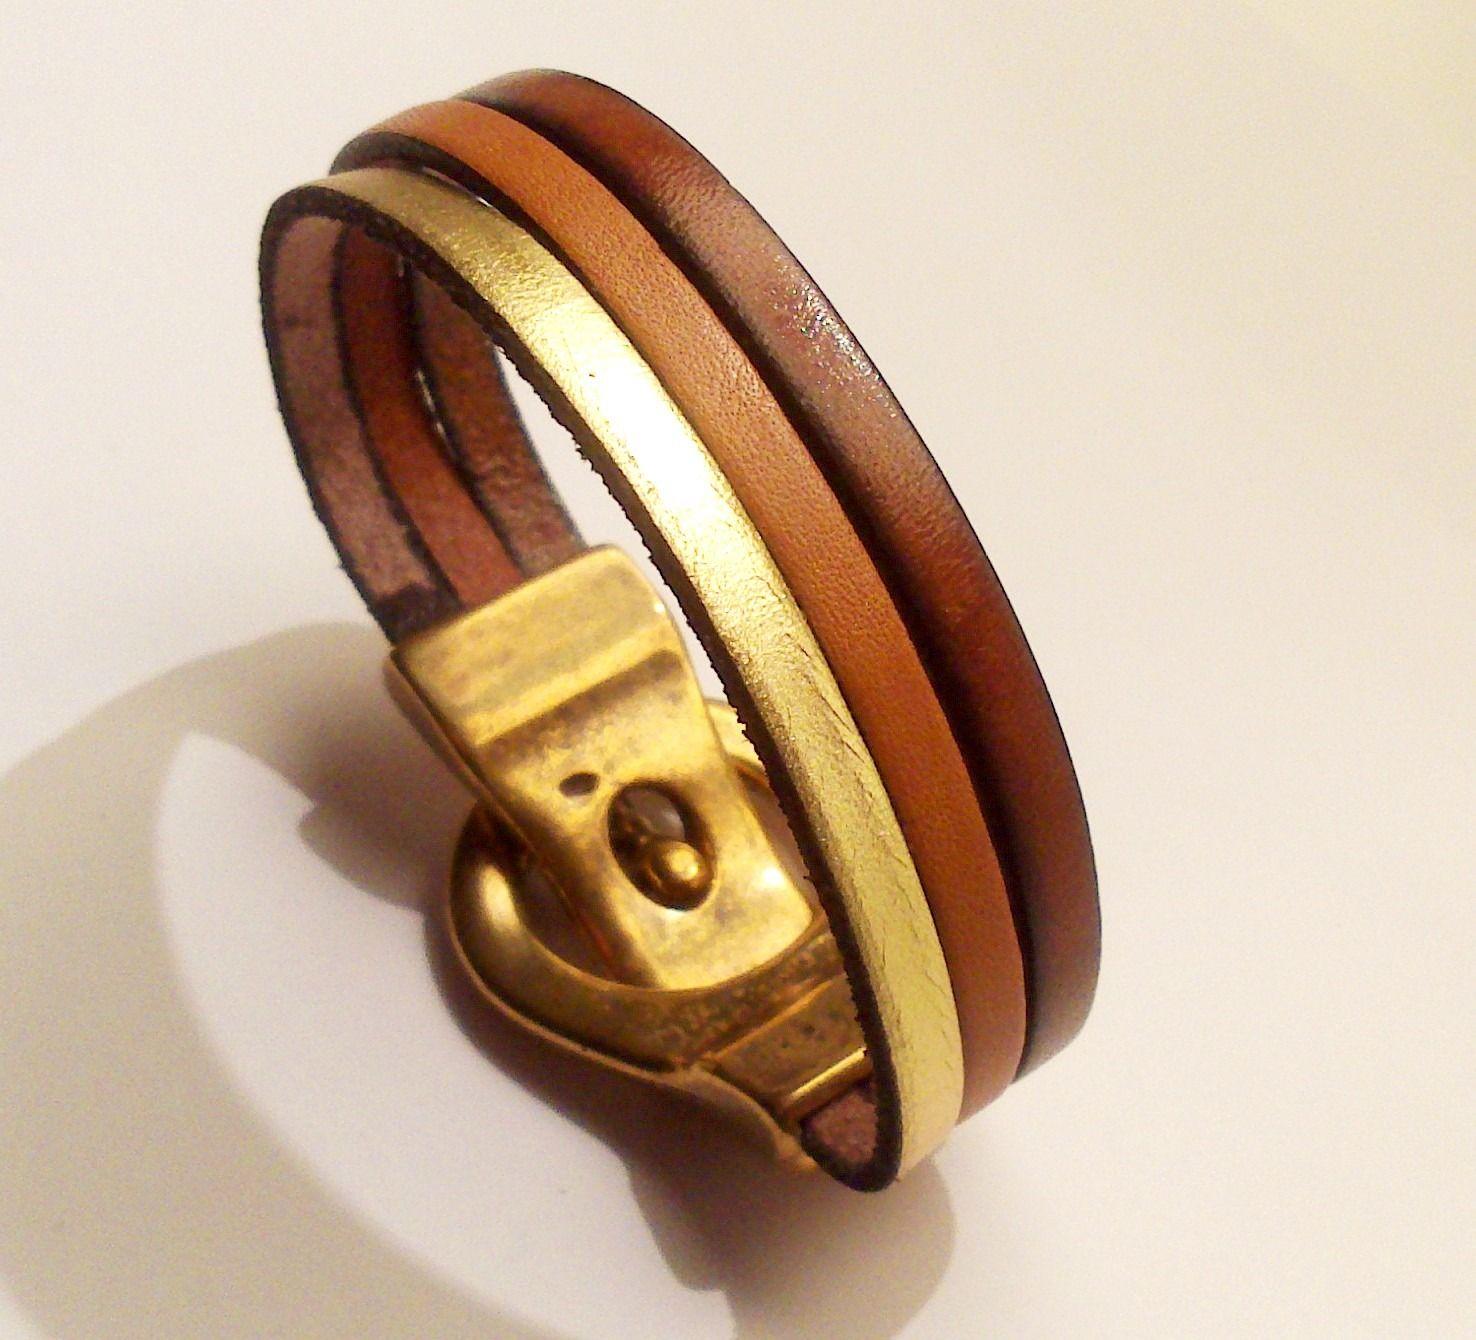 Bijoux cuir et or